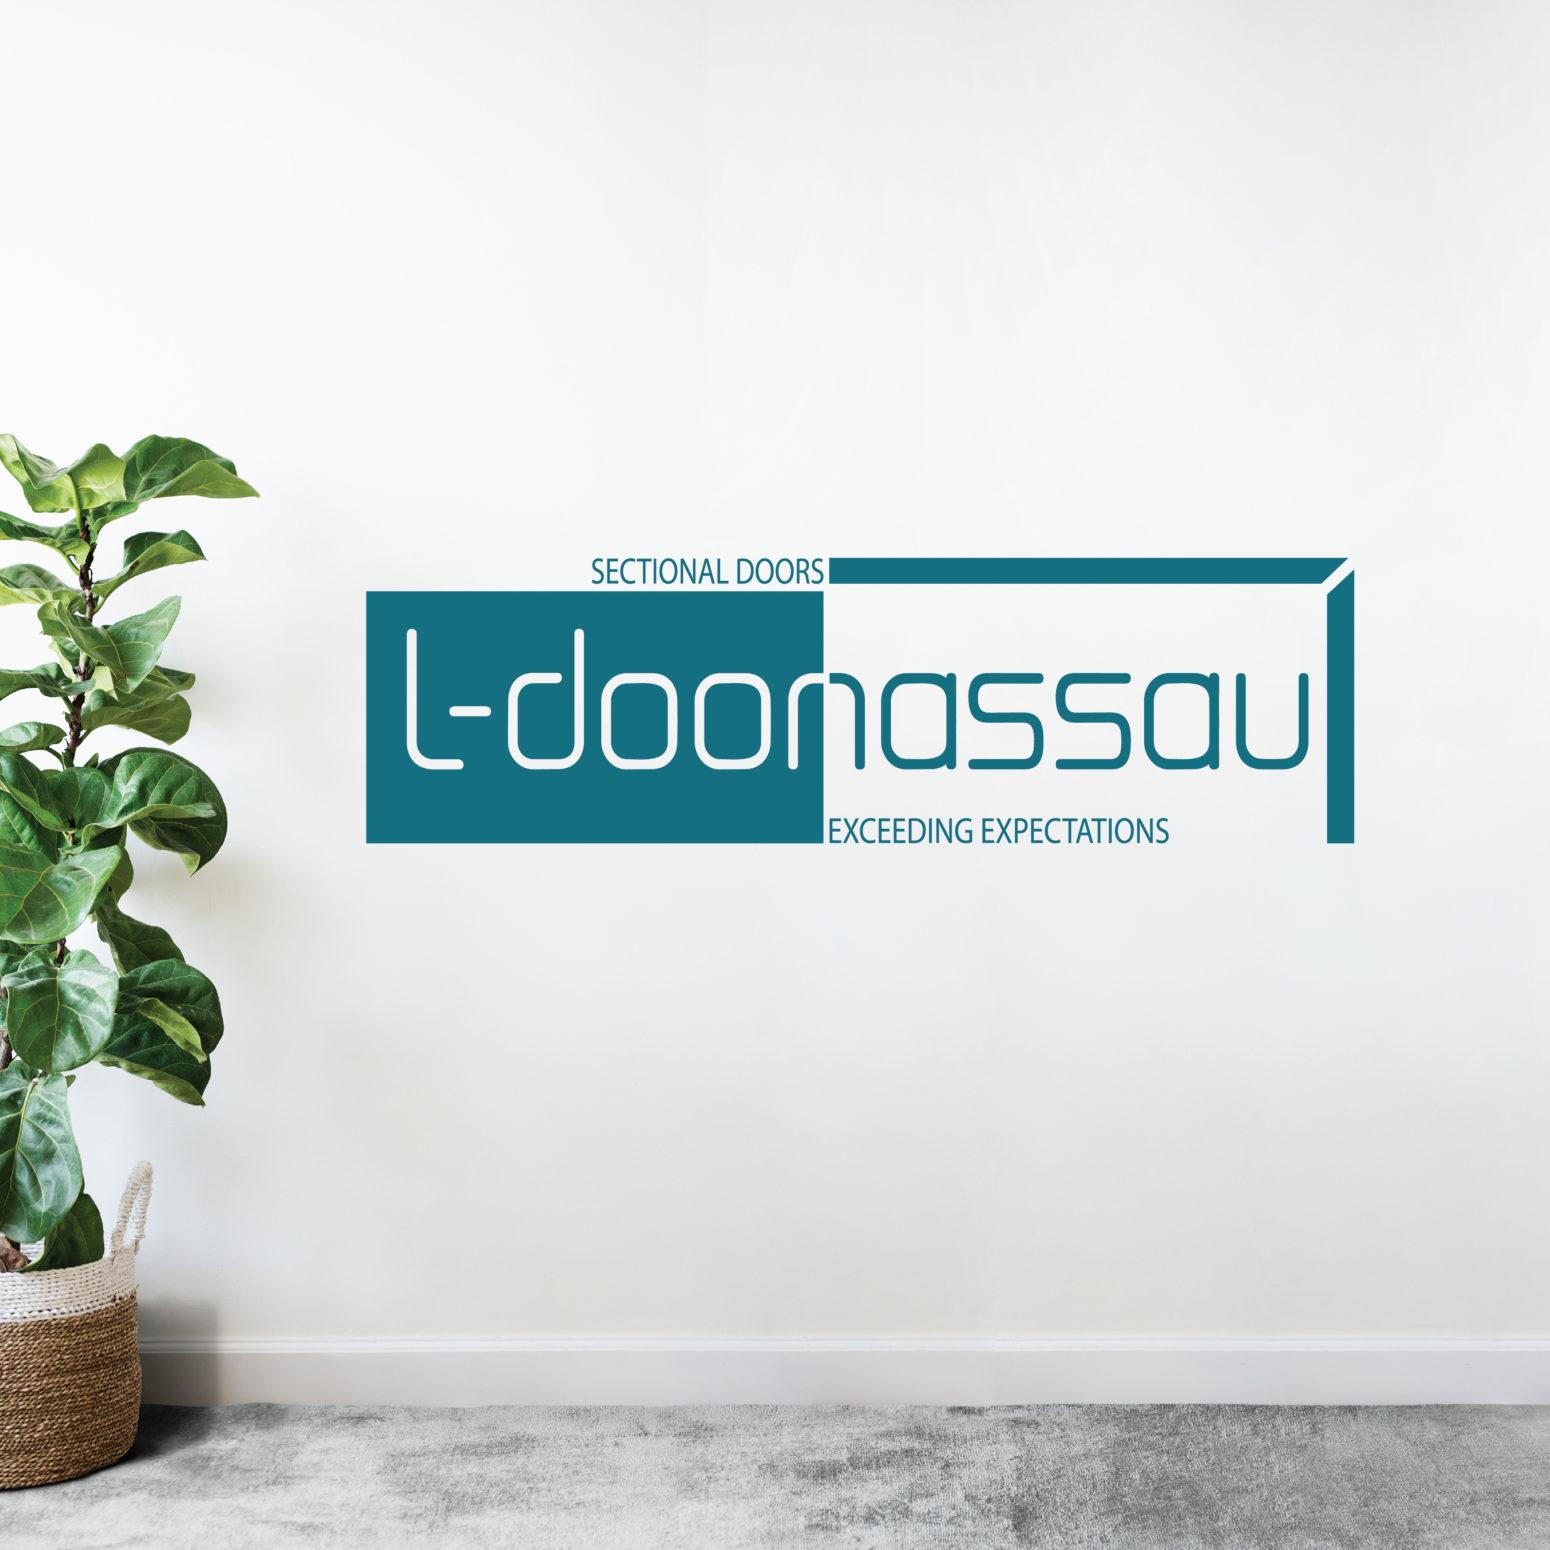 logo L-doornassau